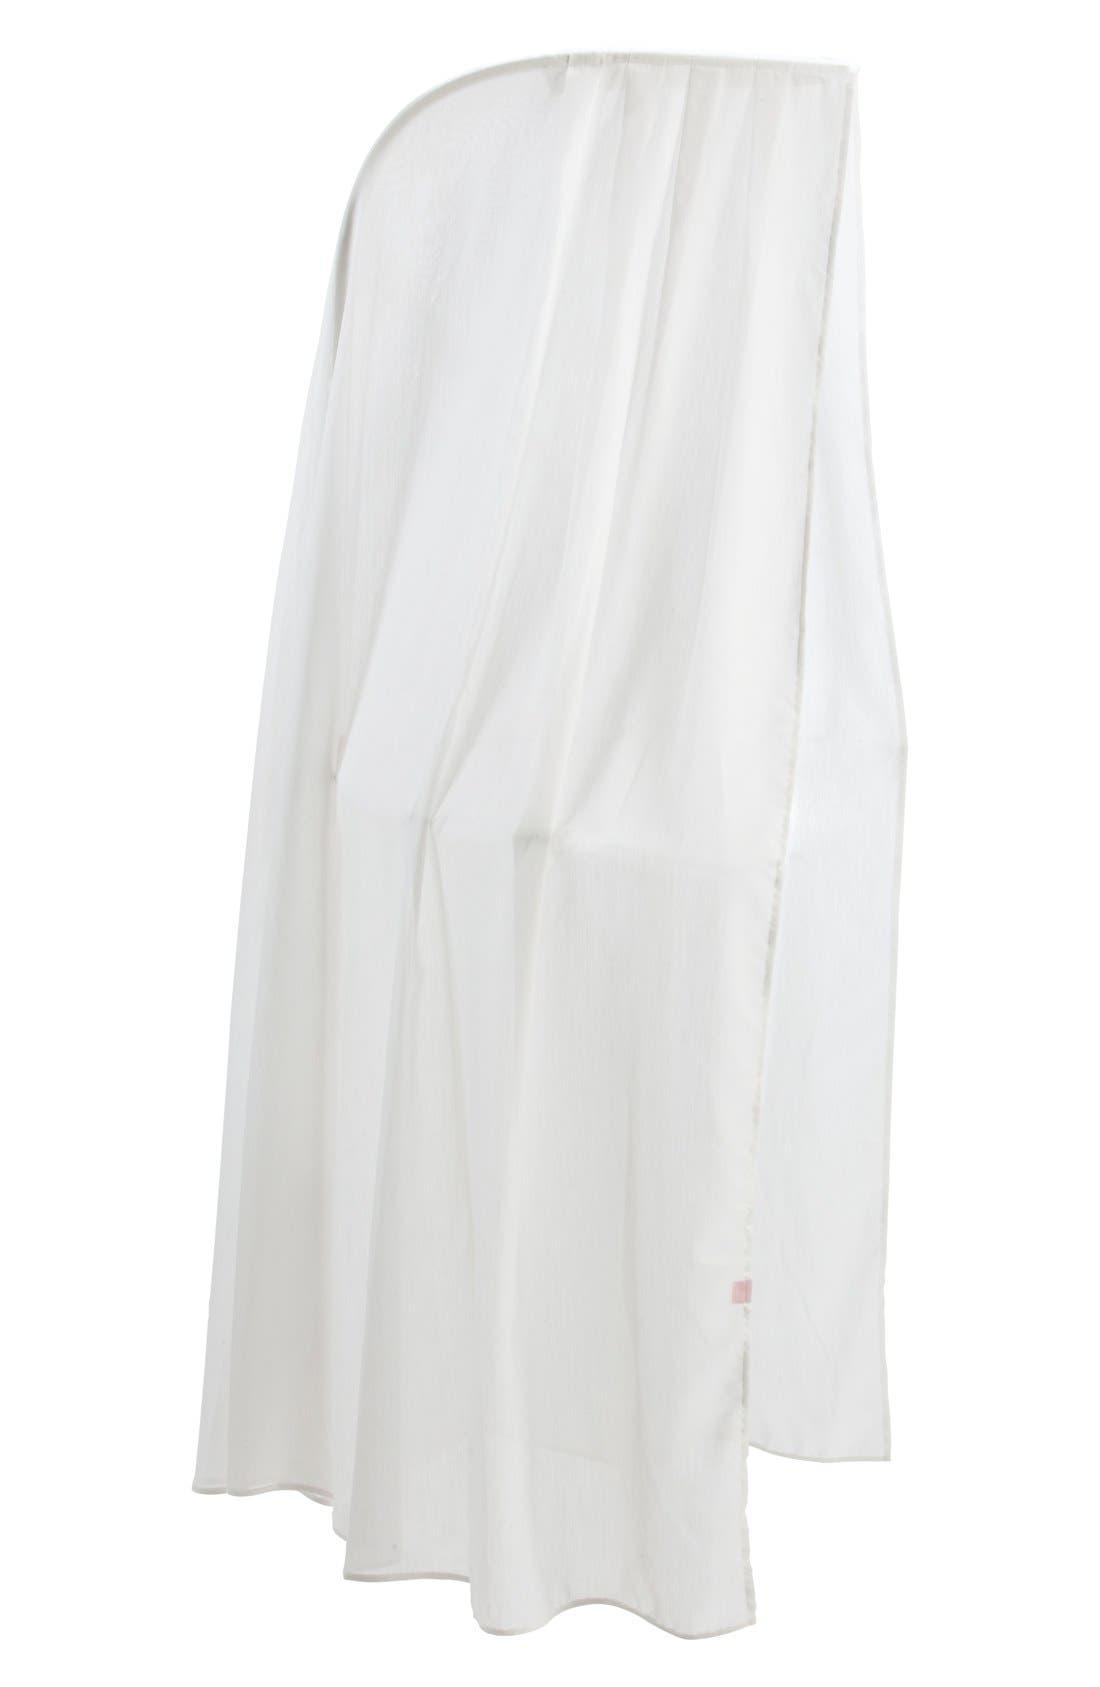 Sleepi Canopy,                         Main,                         color, WHITE